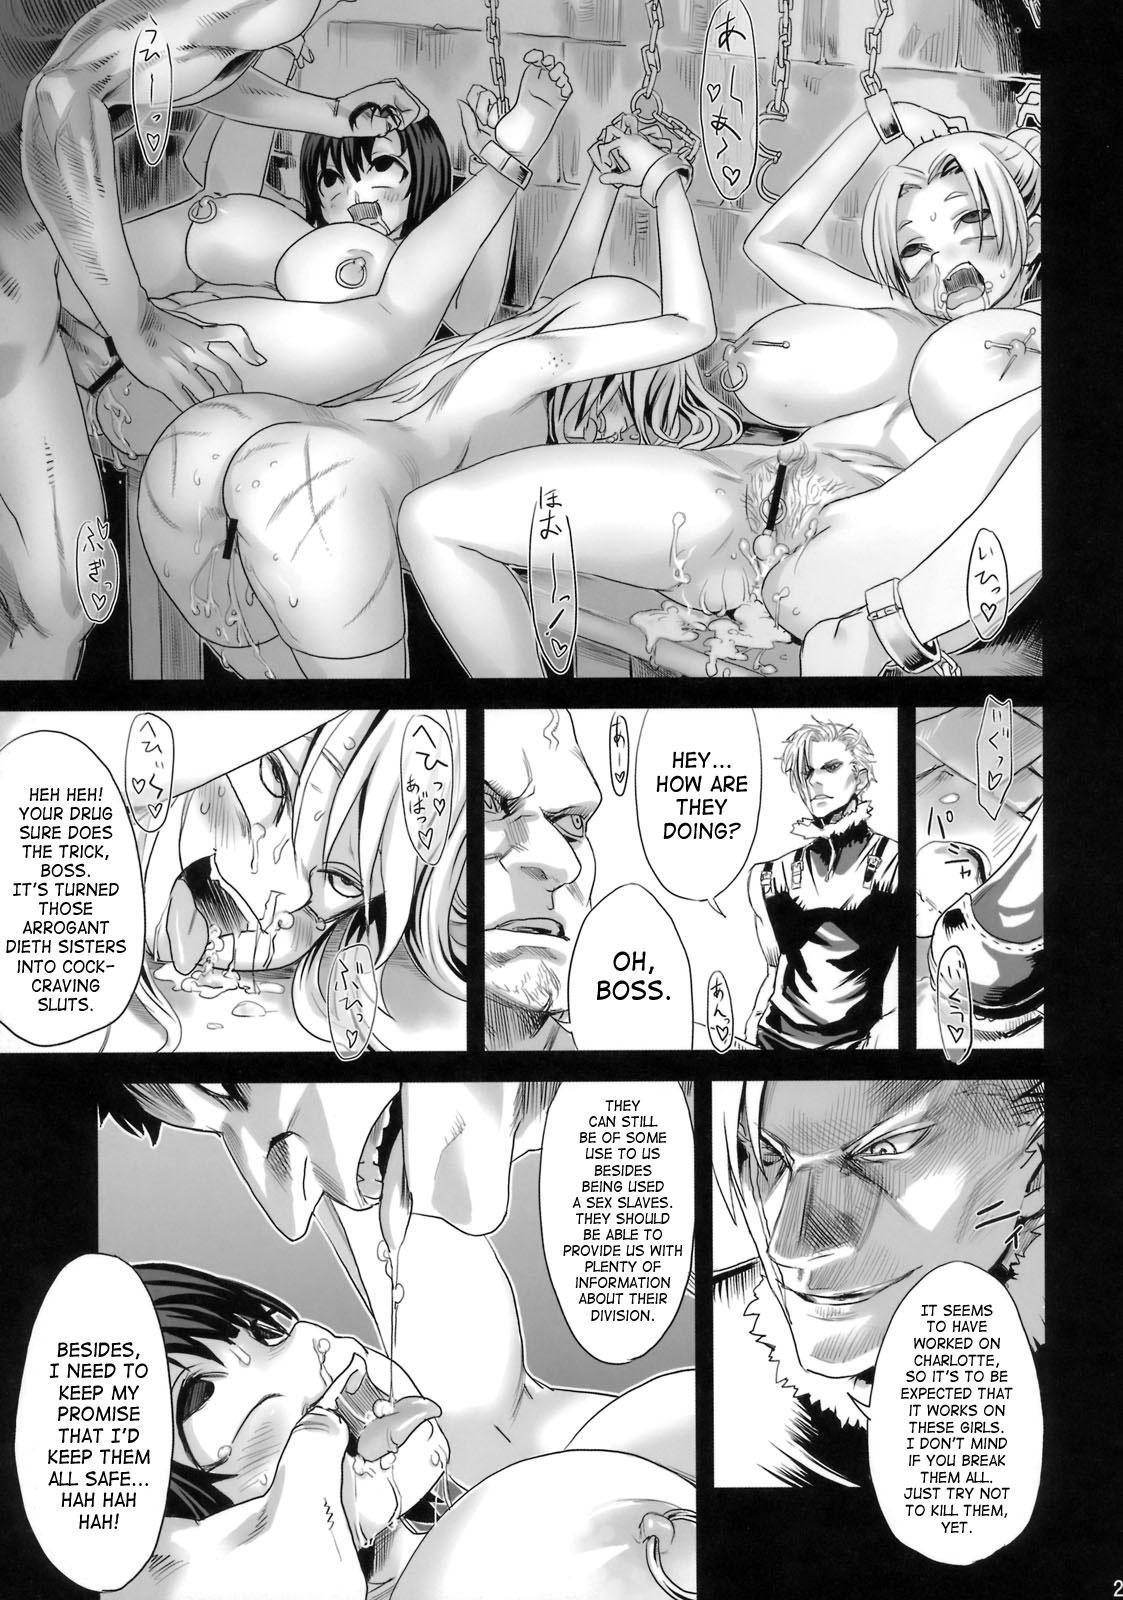 (C76) [Fatalpulse (Asanagi)] Victim Girls 7 - Jaku Niku Kyoushoku Dog-eat-Bitch (Fantasy Earth Zero) [English] [SaHa] 21